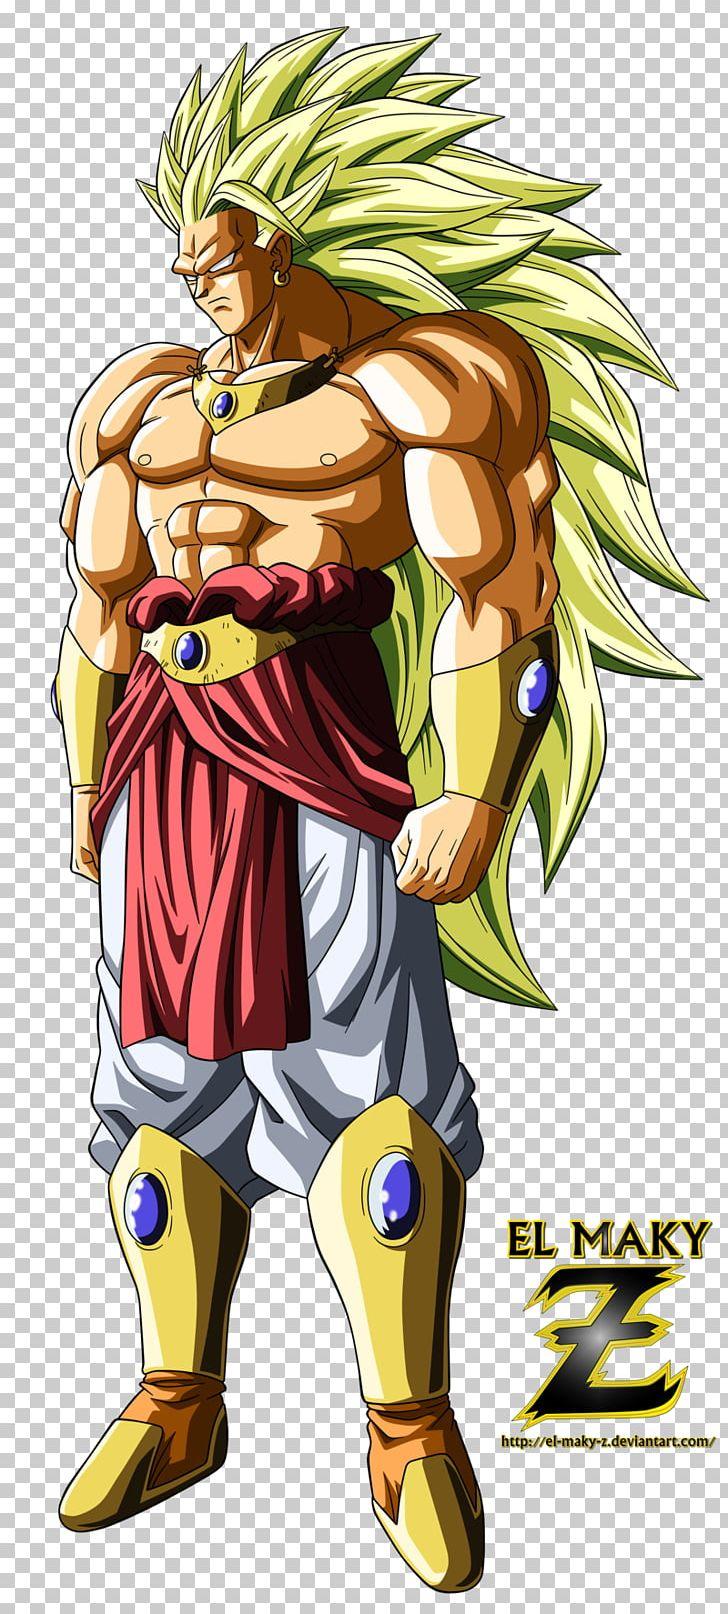 Bio broly clipart clipart freeuse Goku Bio Broly Vegeta Trunks Gohan PNG, Clipart, Anime, Art, Bio ... clipart freeuse